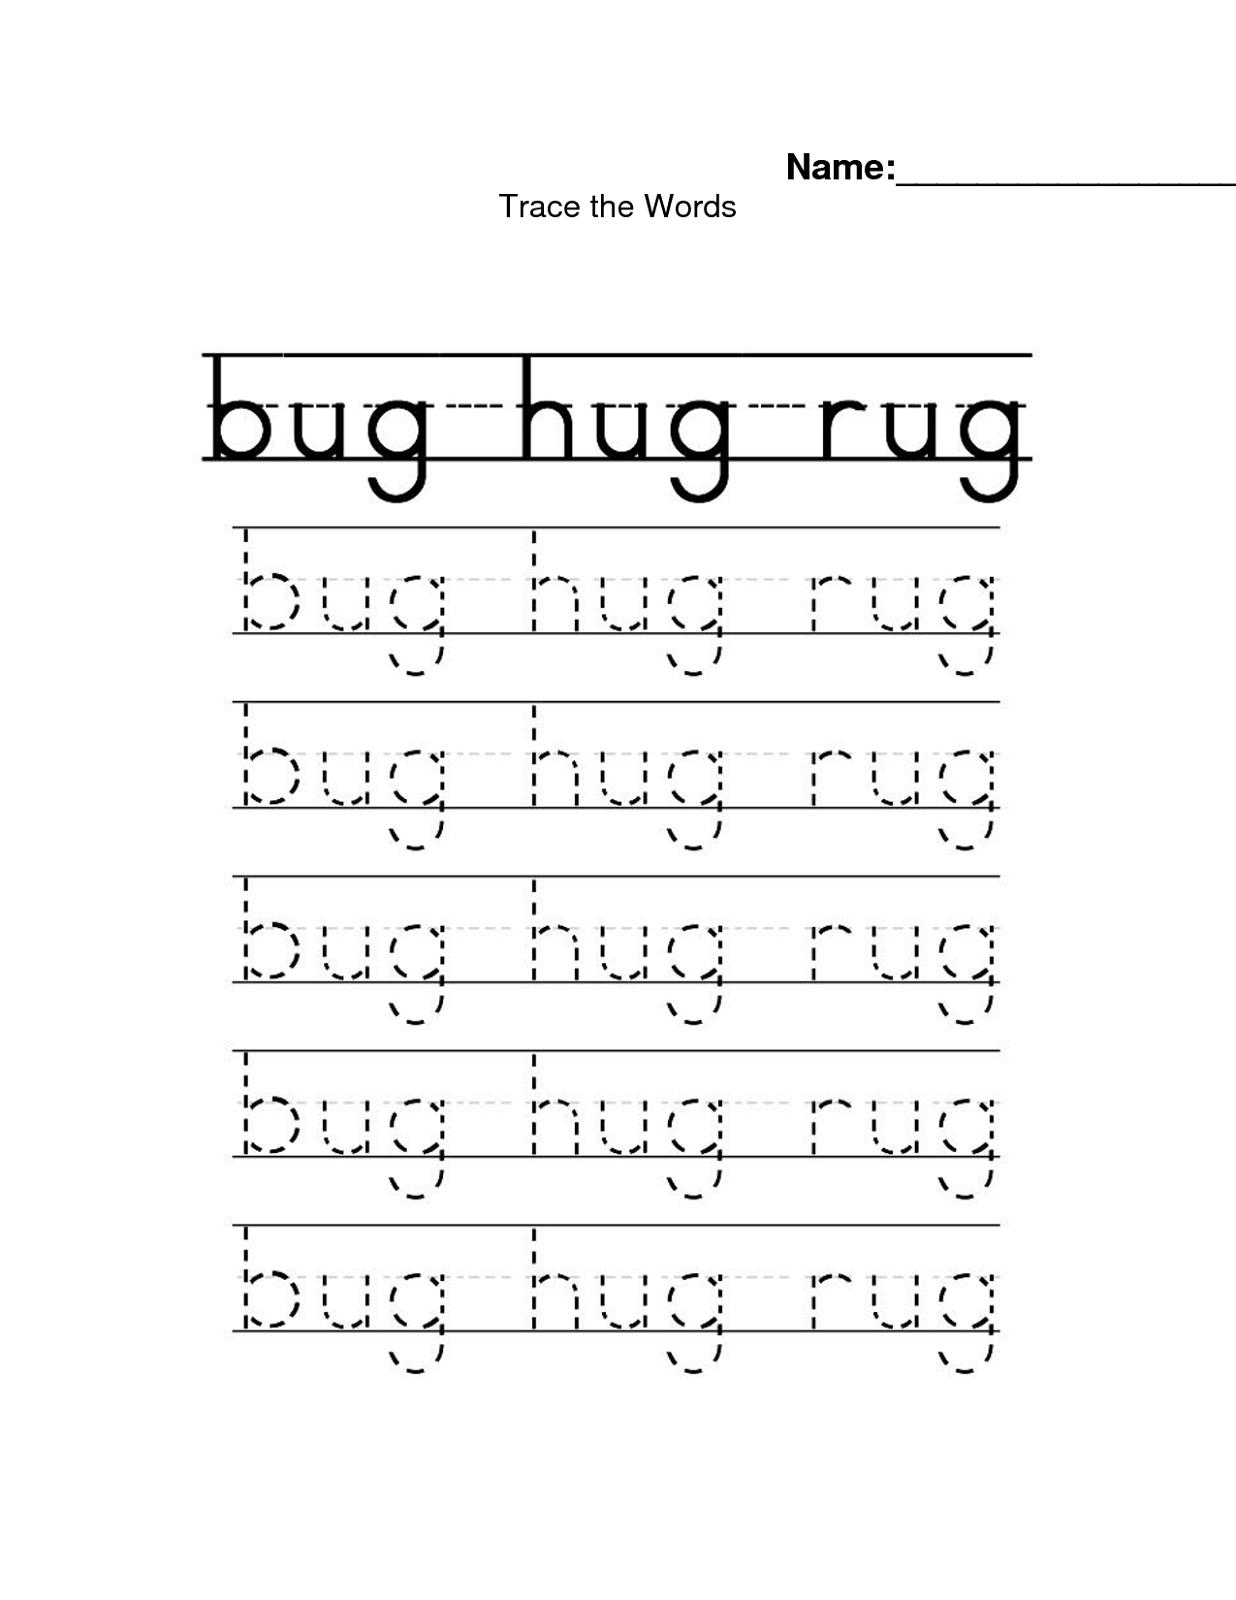 Traceable Names Worksheets Word